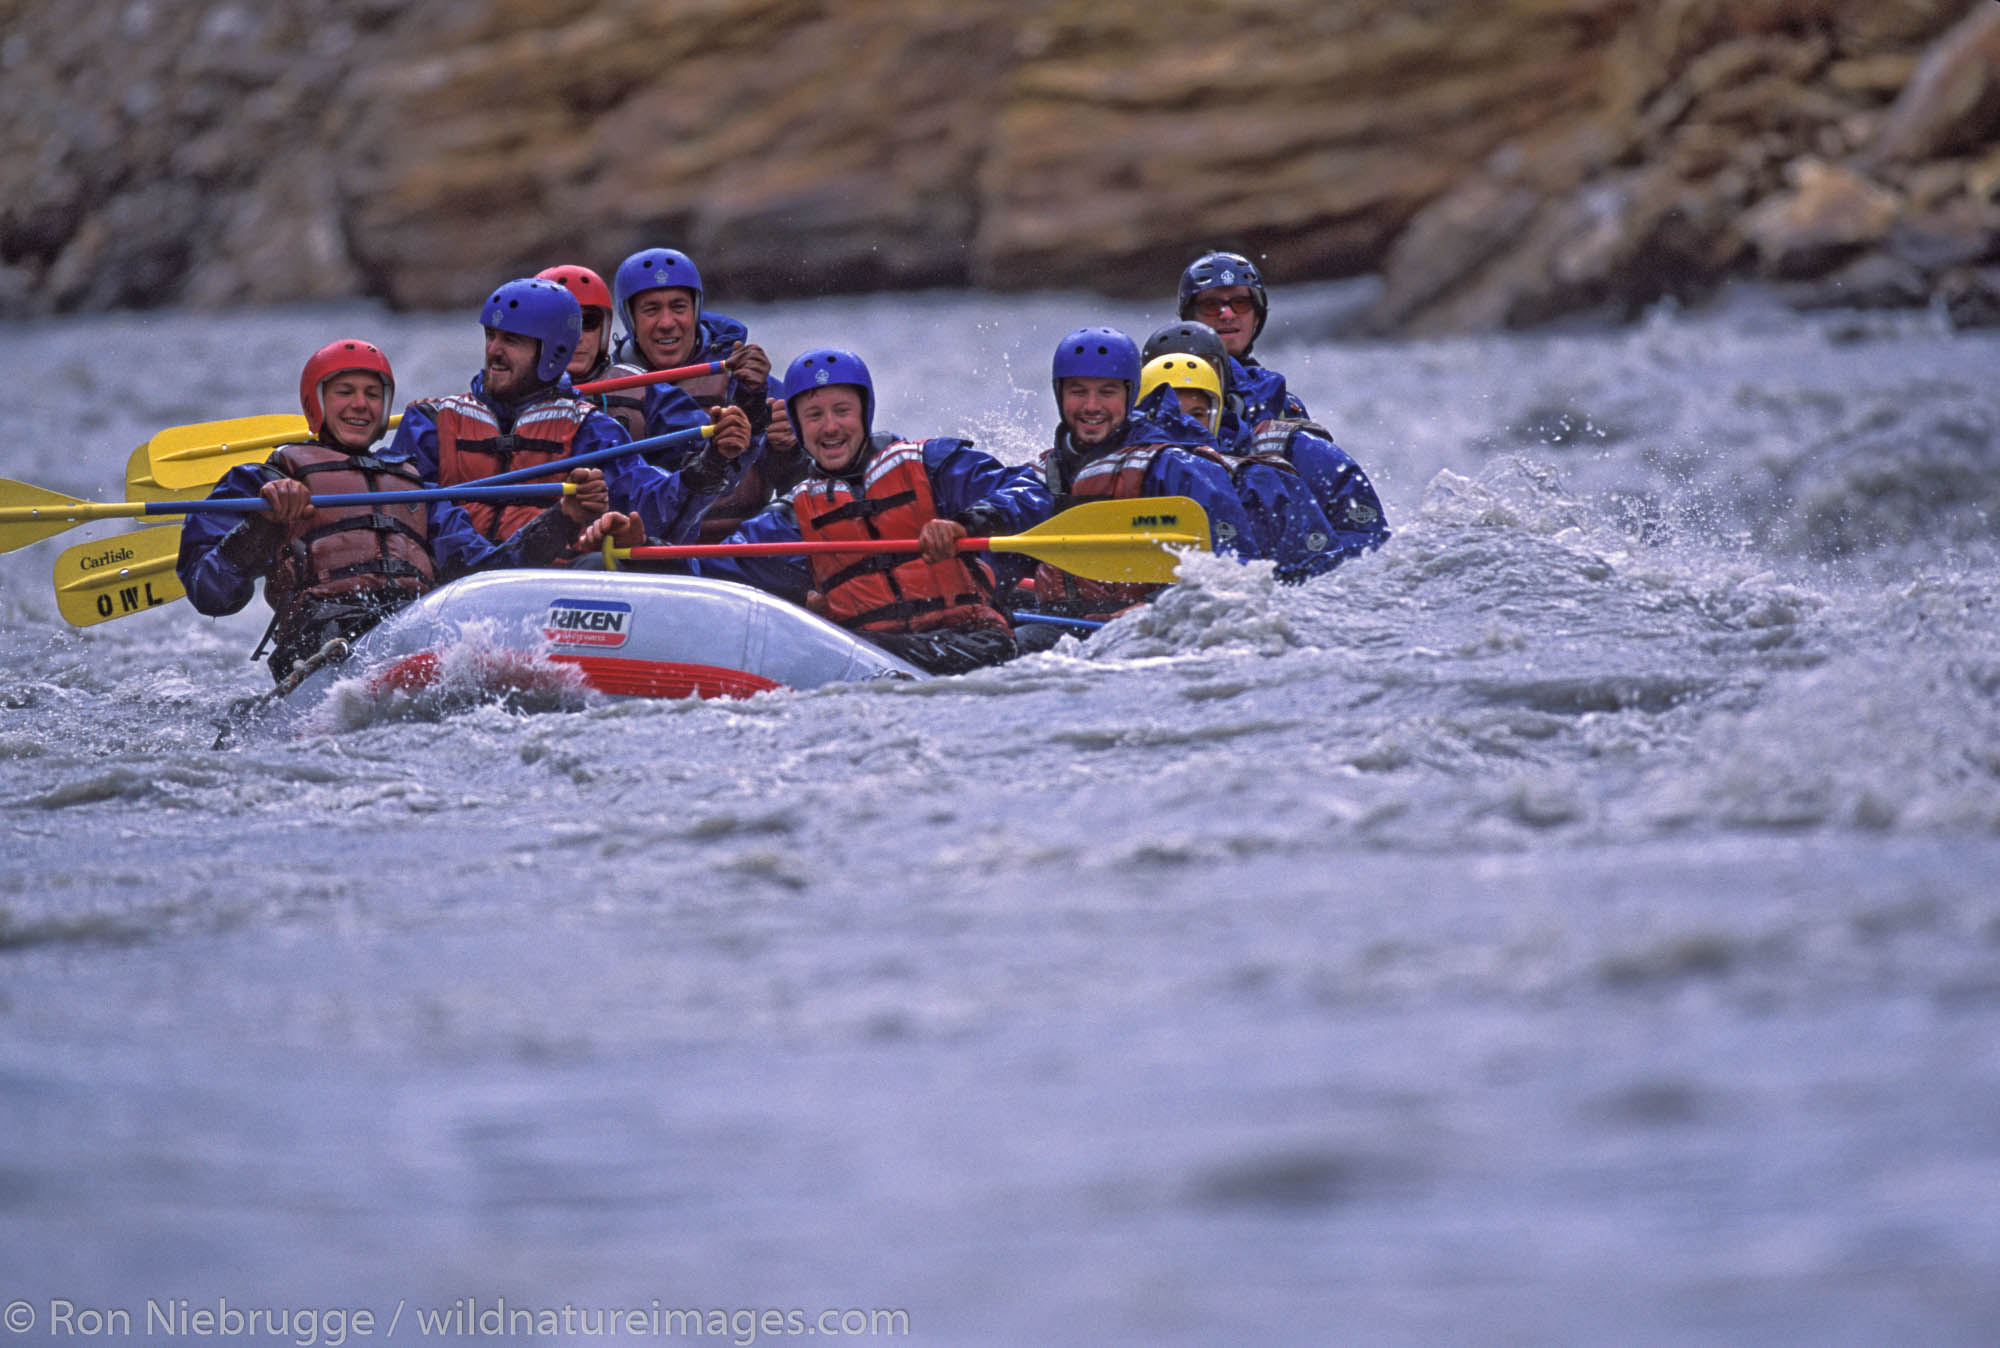 Rafting on the Nenana River, near Denali National Park, Alaska.